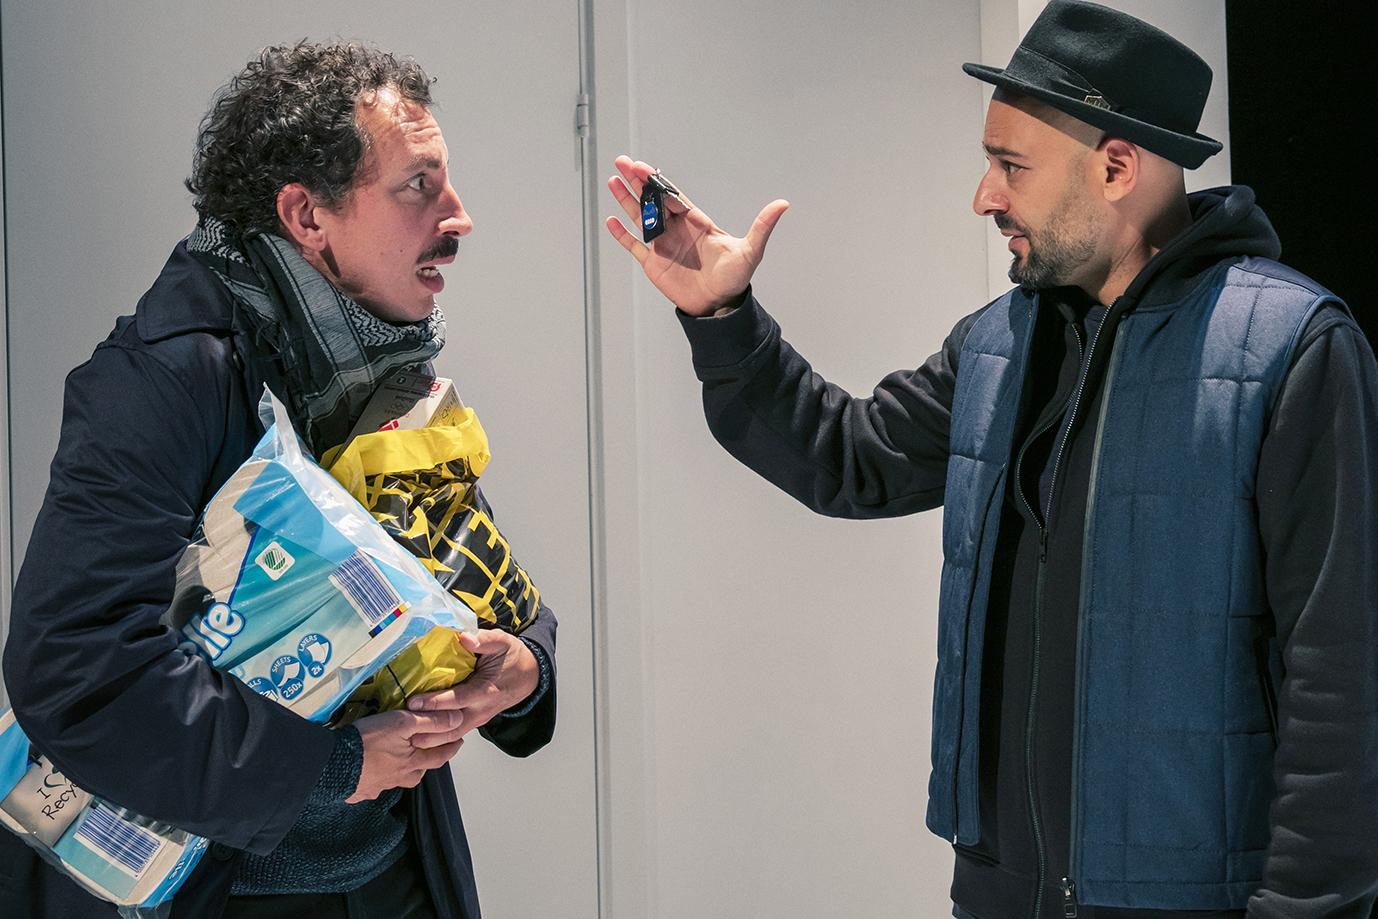 Ernesto Piga Carbone og Janus Nabil Bakrawi. Foto: Thomas Cato